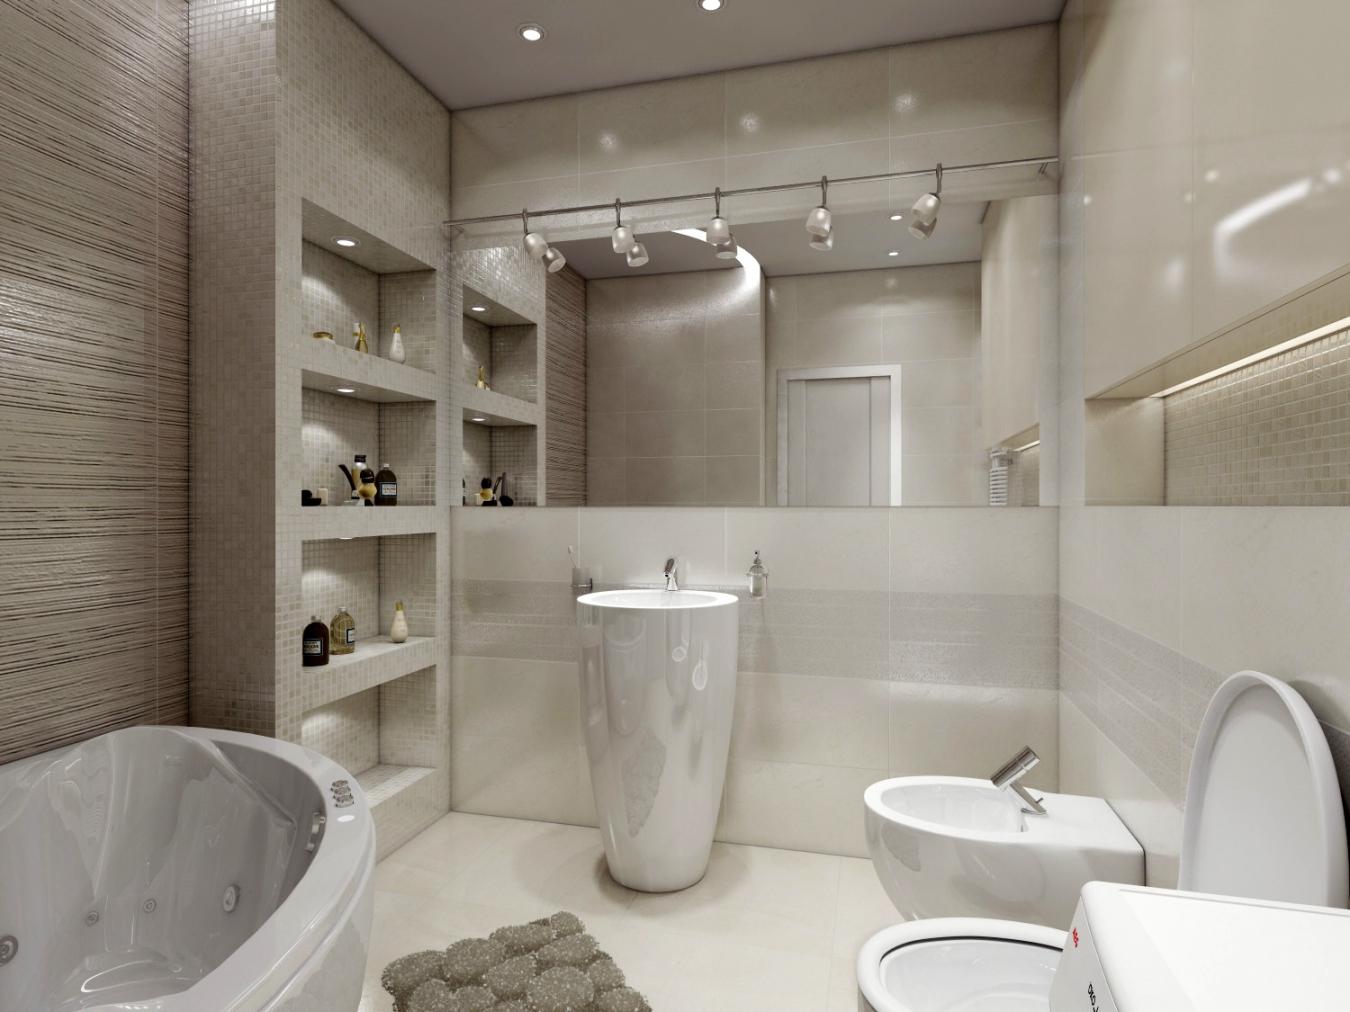 Дизайн ванной комнаты 5 кв.м. фото